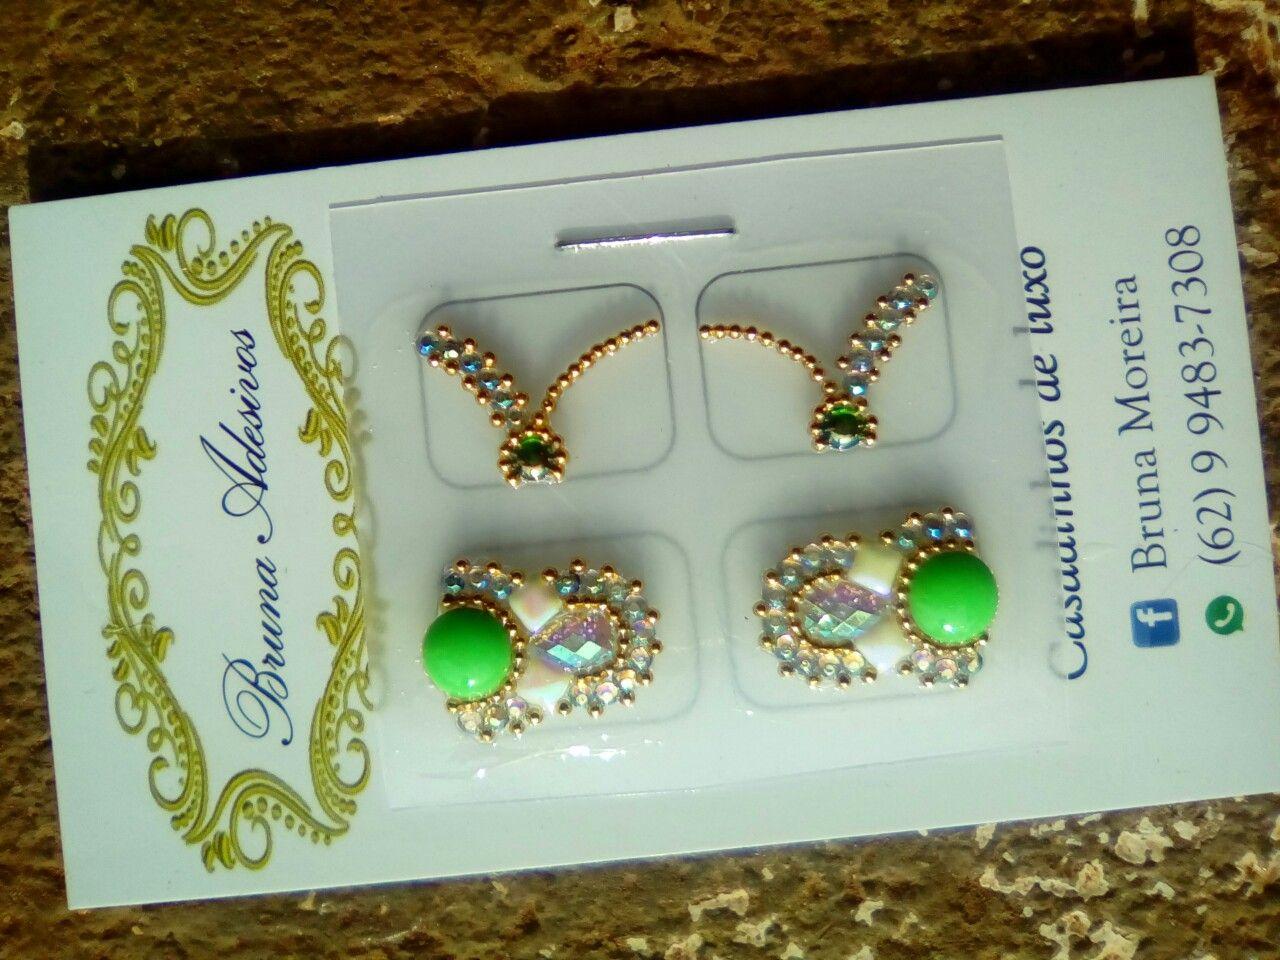 Pin de Maria Guadalupe en decoracion de uñas   Pinterest ...